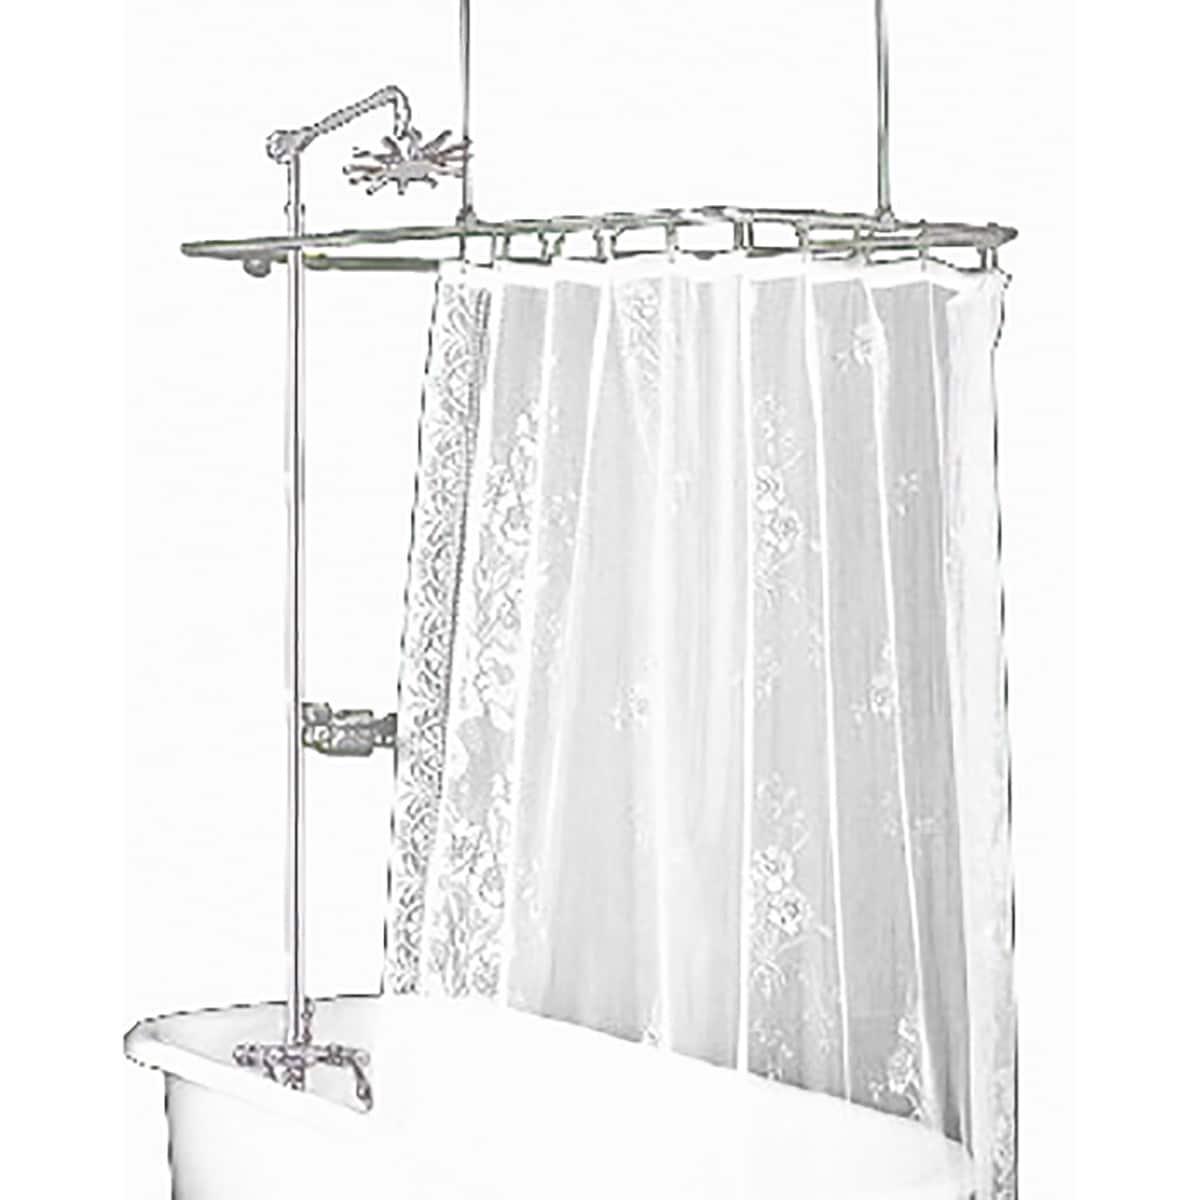 Clawfoot Tub Shower Surround Brass Rectangula | Renovator\'s Supply ...